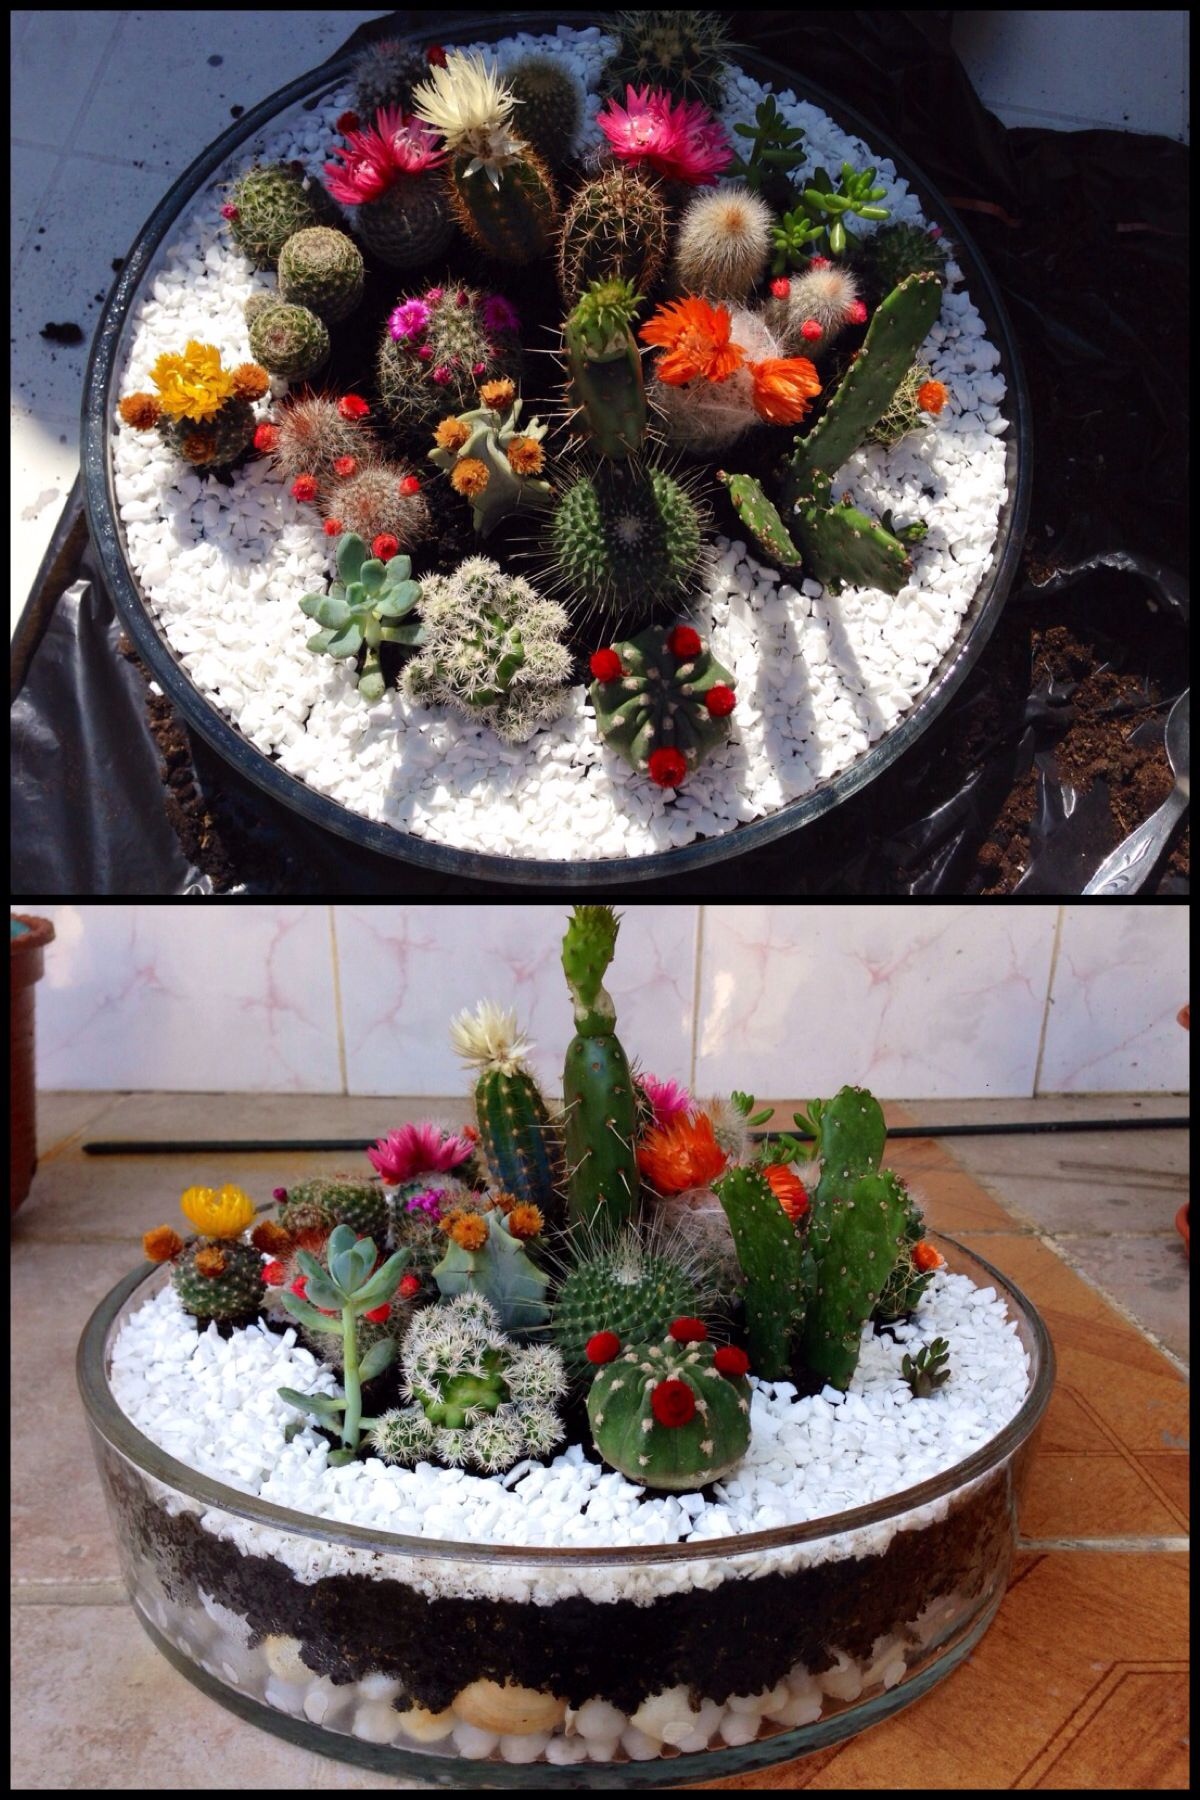 My Mini Cactus' Garden. 25 Years, 25 Cactus